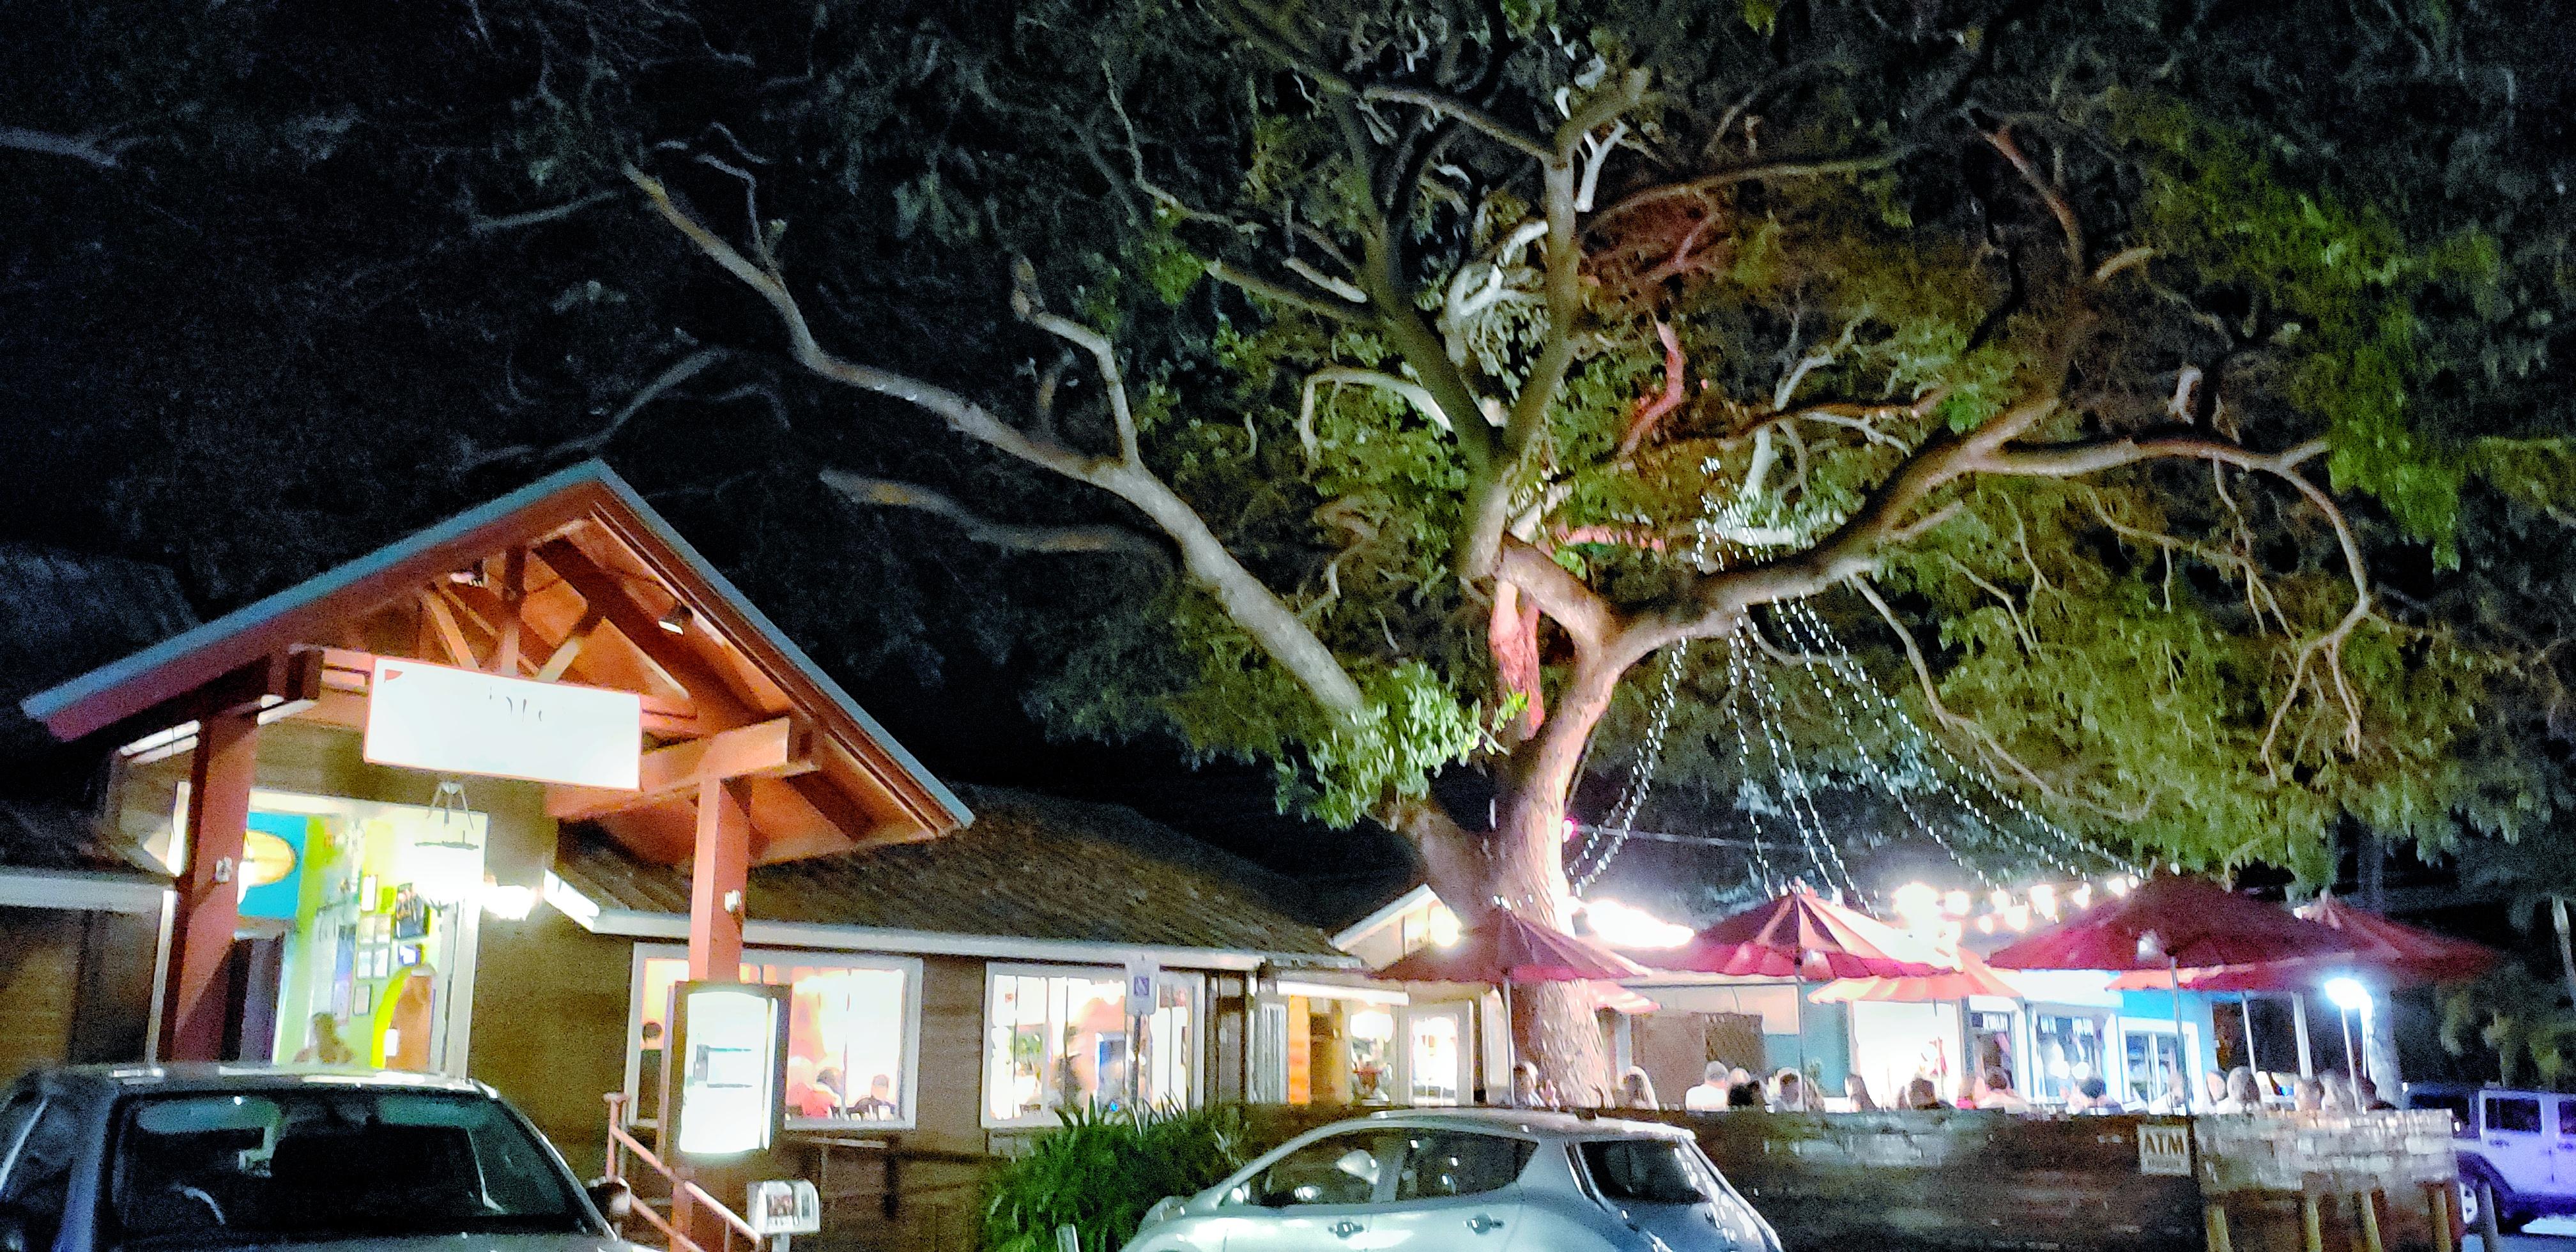 maui eats, three's bar & grill, three's bar and grill, food, maui food, grinds, maui, maui travel guide, sushi, local grinds, hawaii grinds, maui grinds, tourist, what to do on maui, oysters,